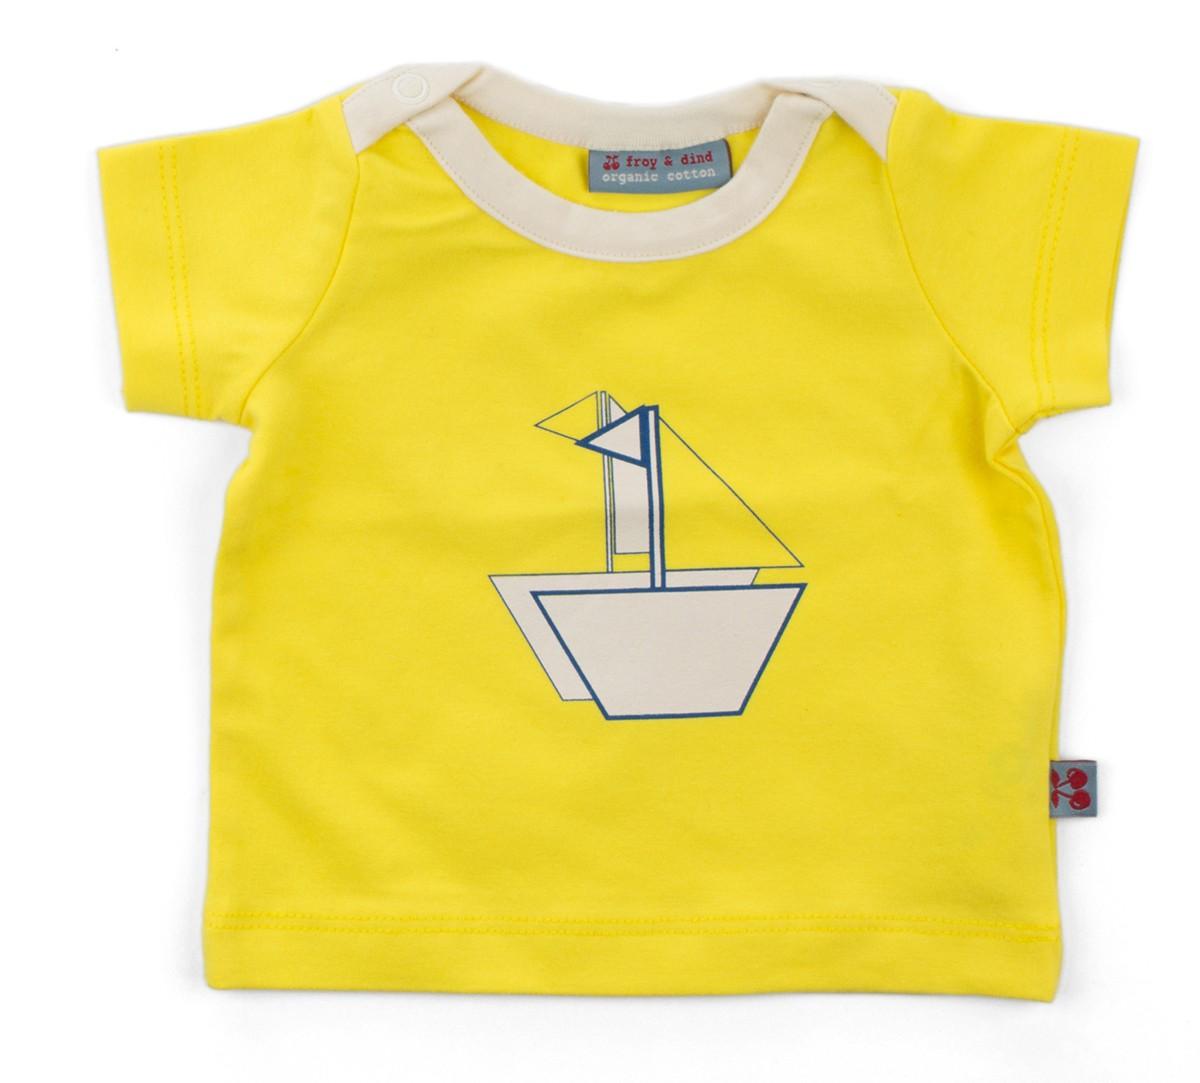 Tito boat t-shirt